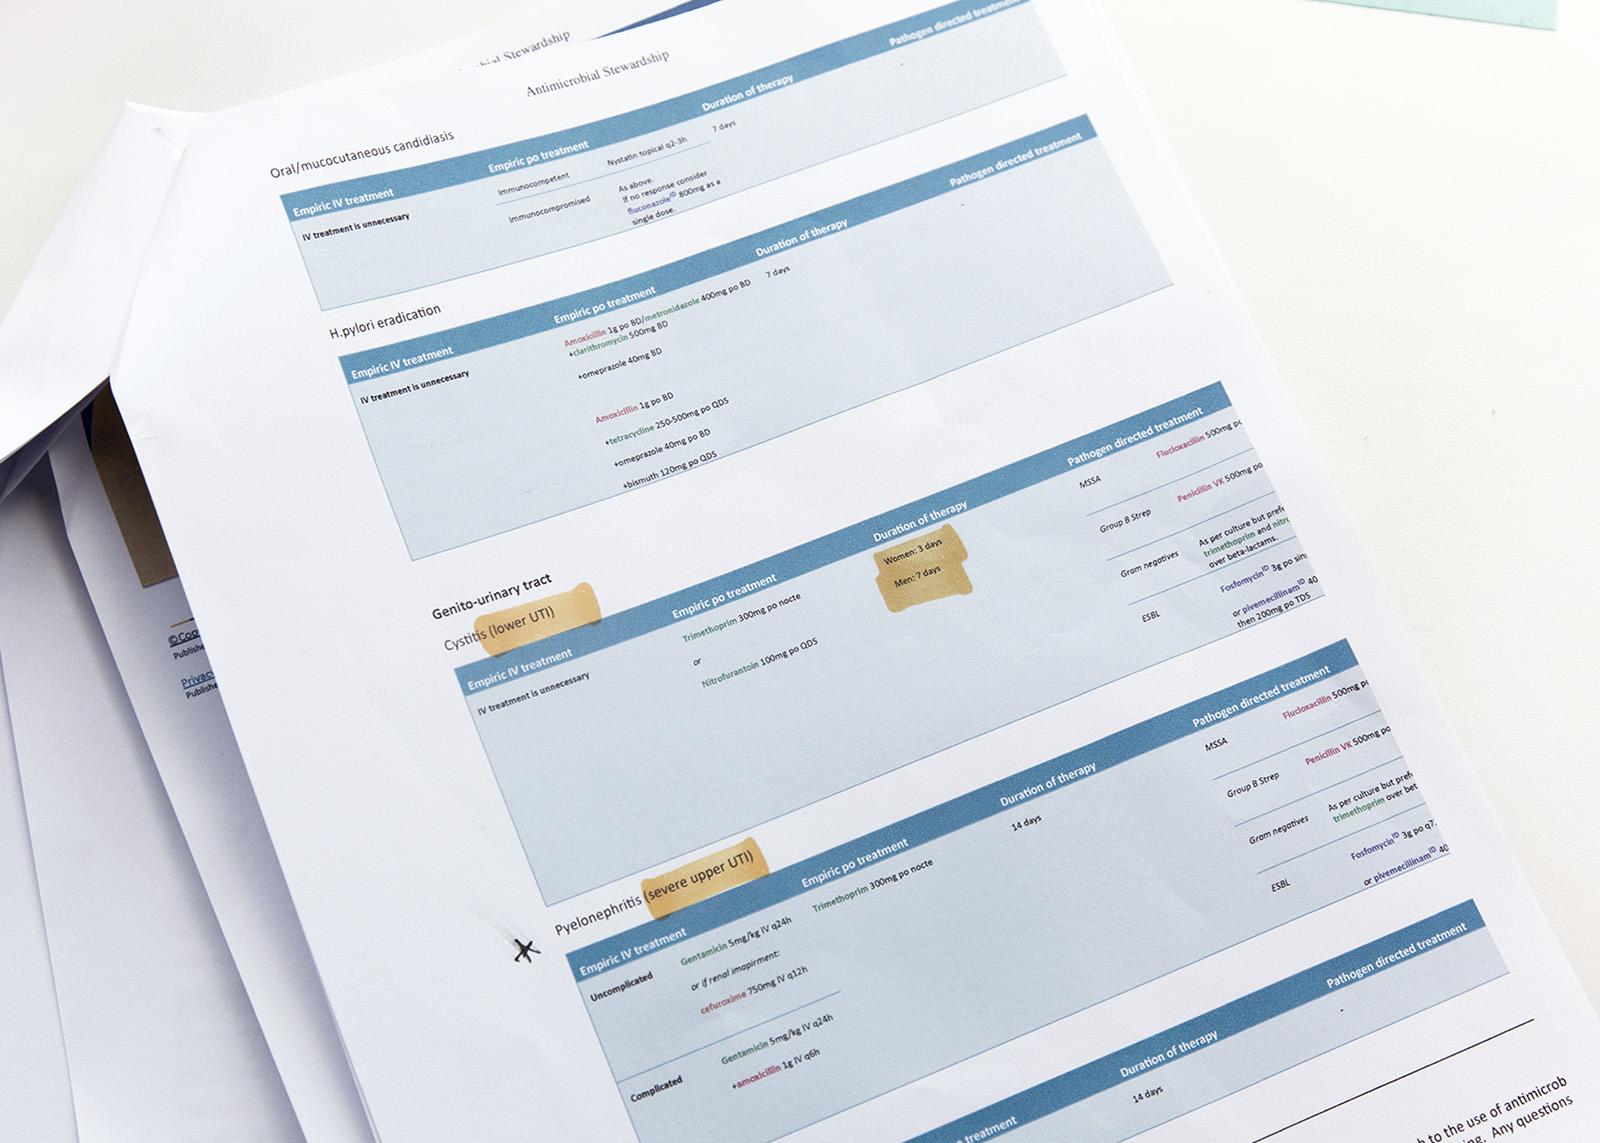 5b6d7fe4e5d6e2240ae955e3_Paper Guidelines.jpg